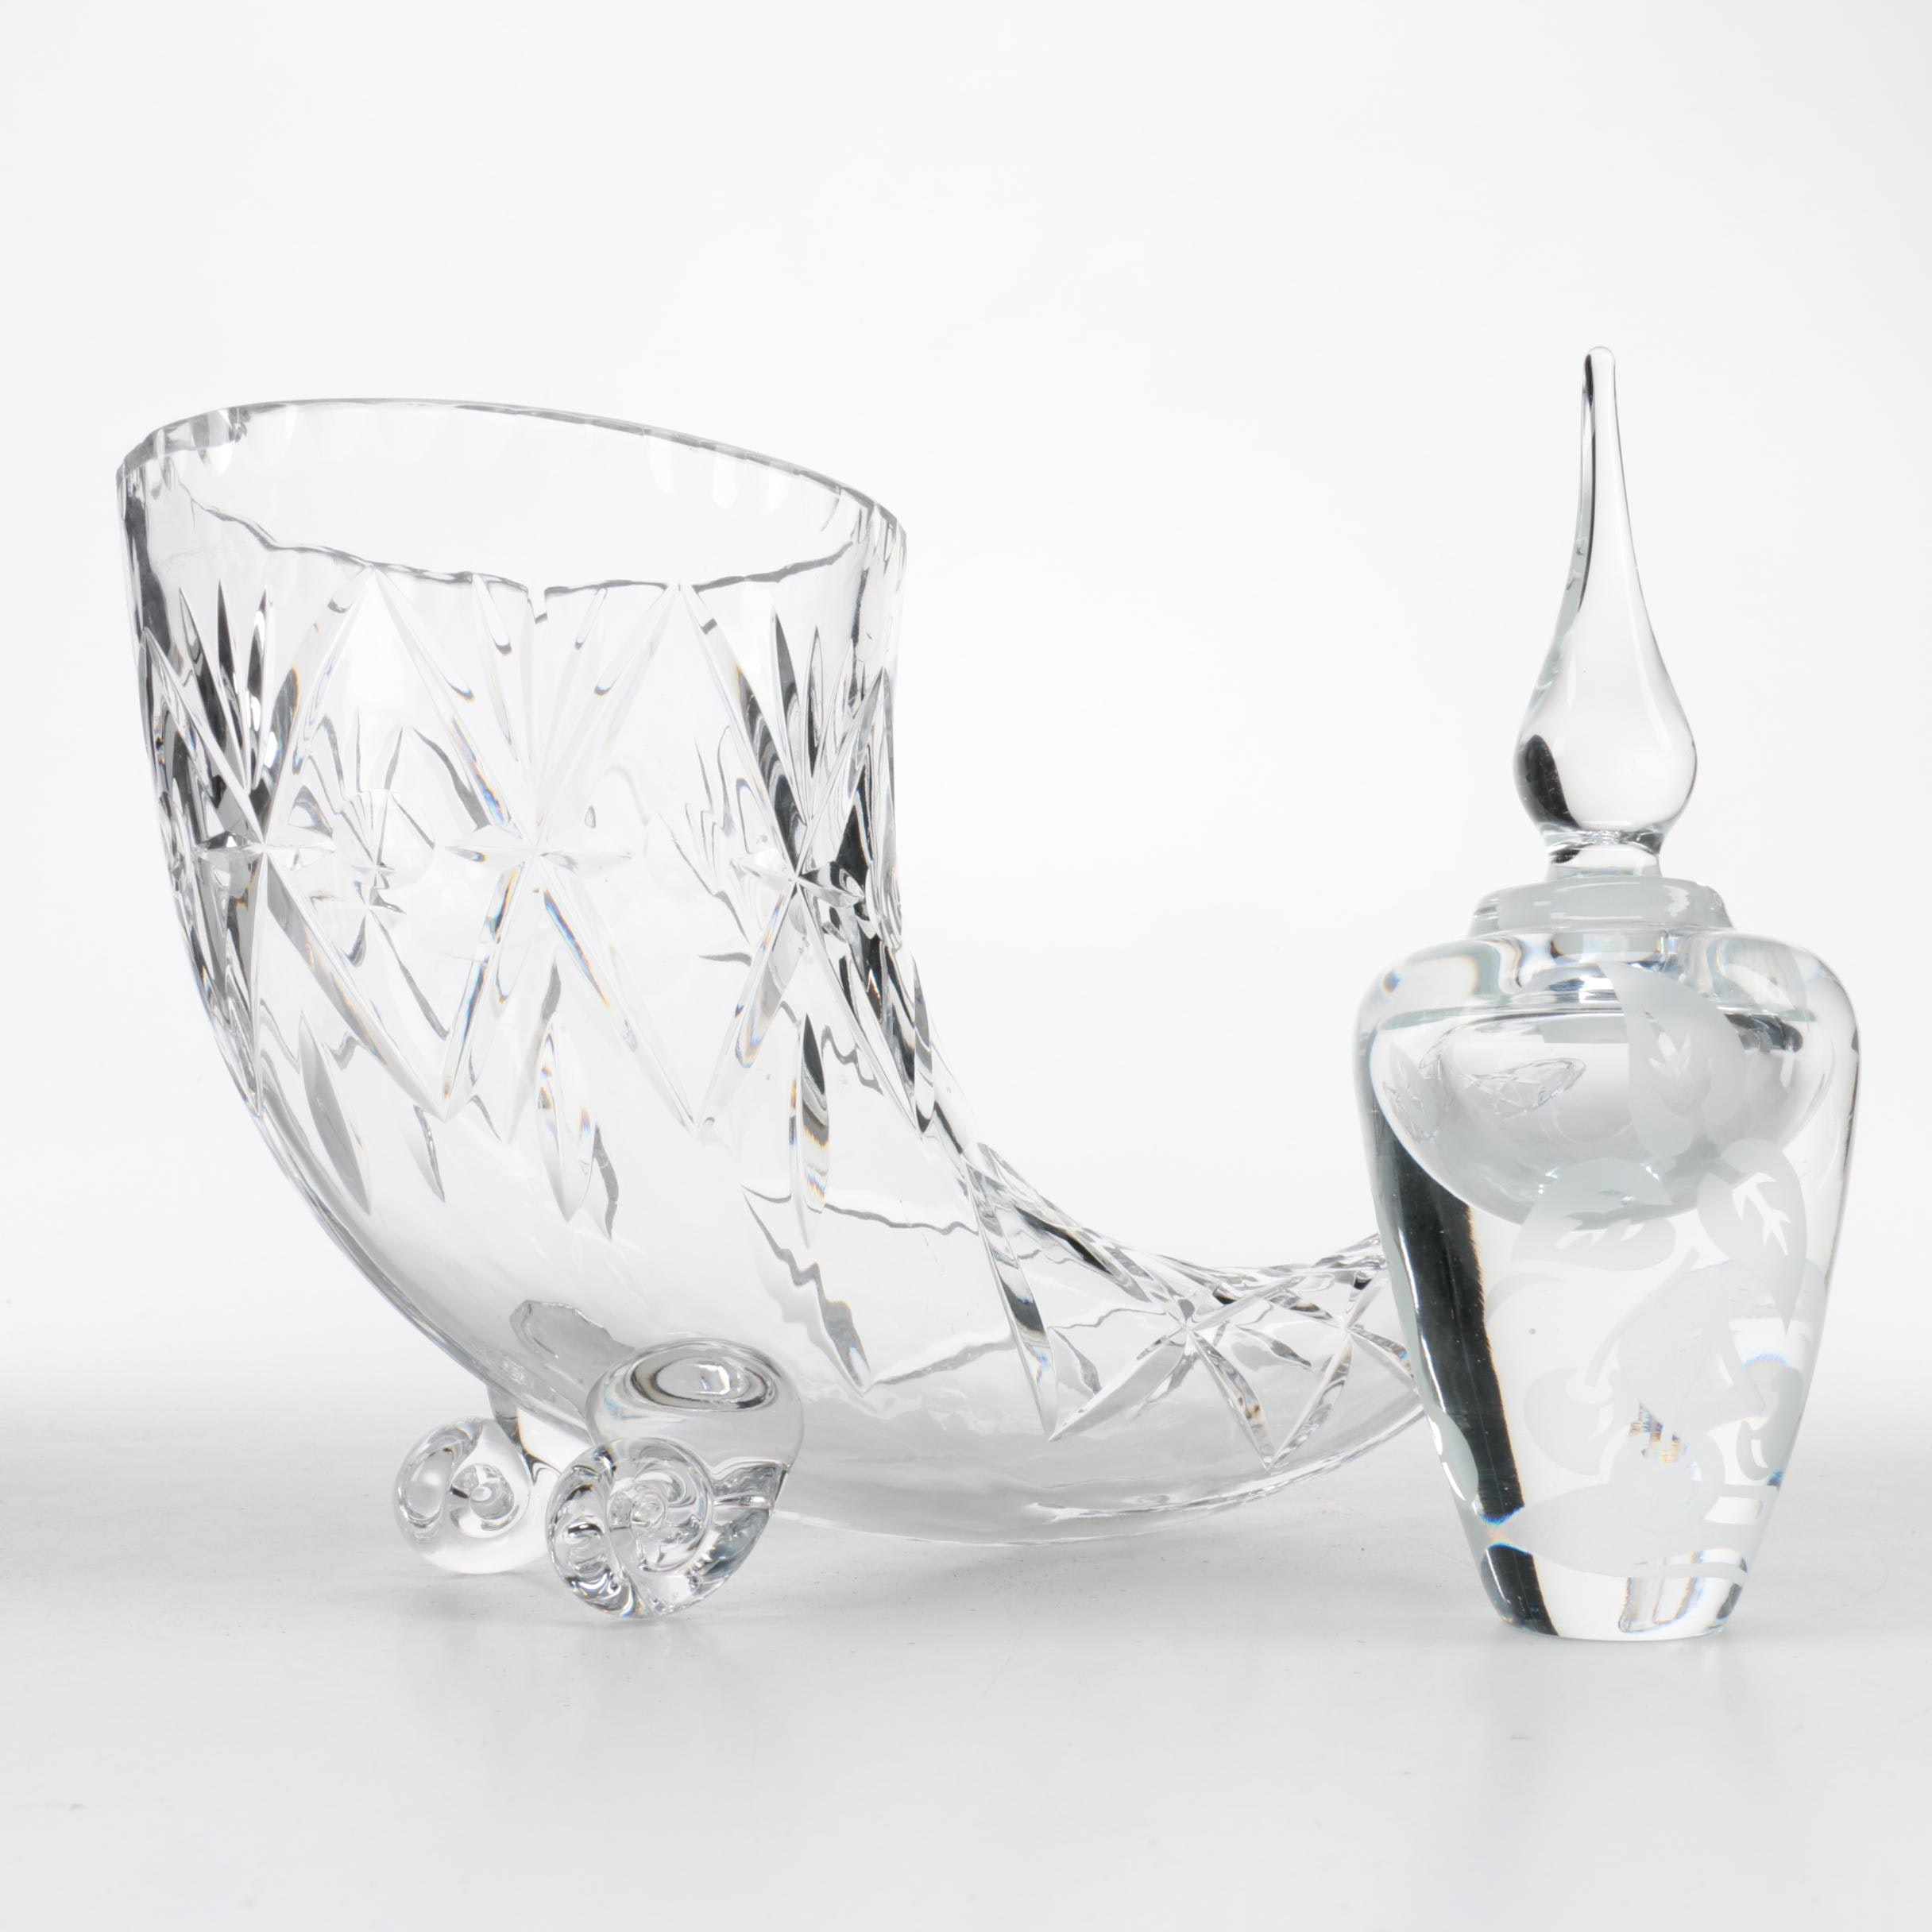 Signed Barry Sautner Glass Perfume Bottle and a Crystal Cornucopia Vase